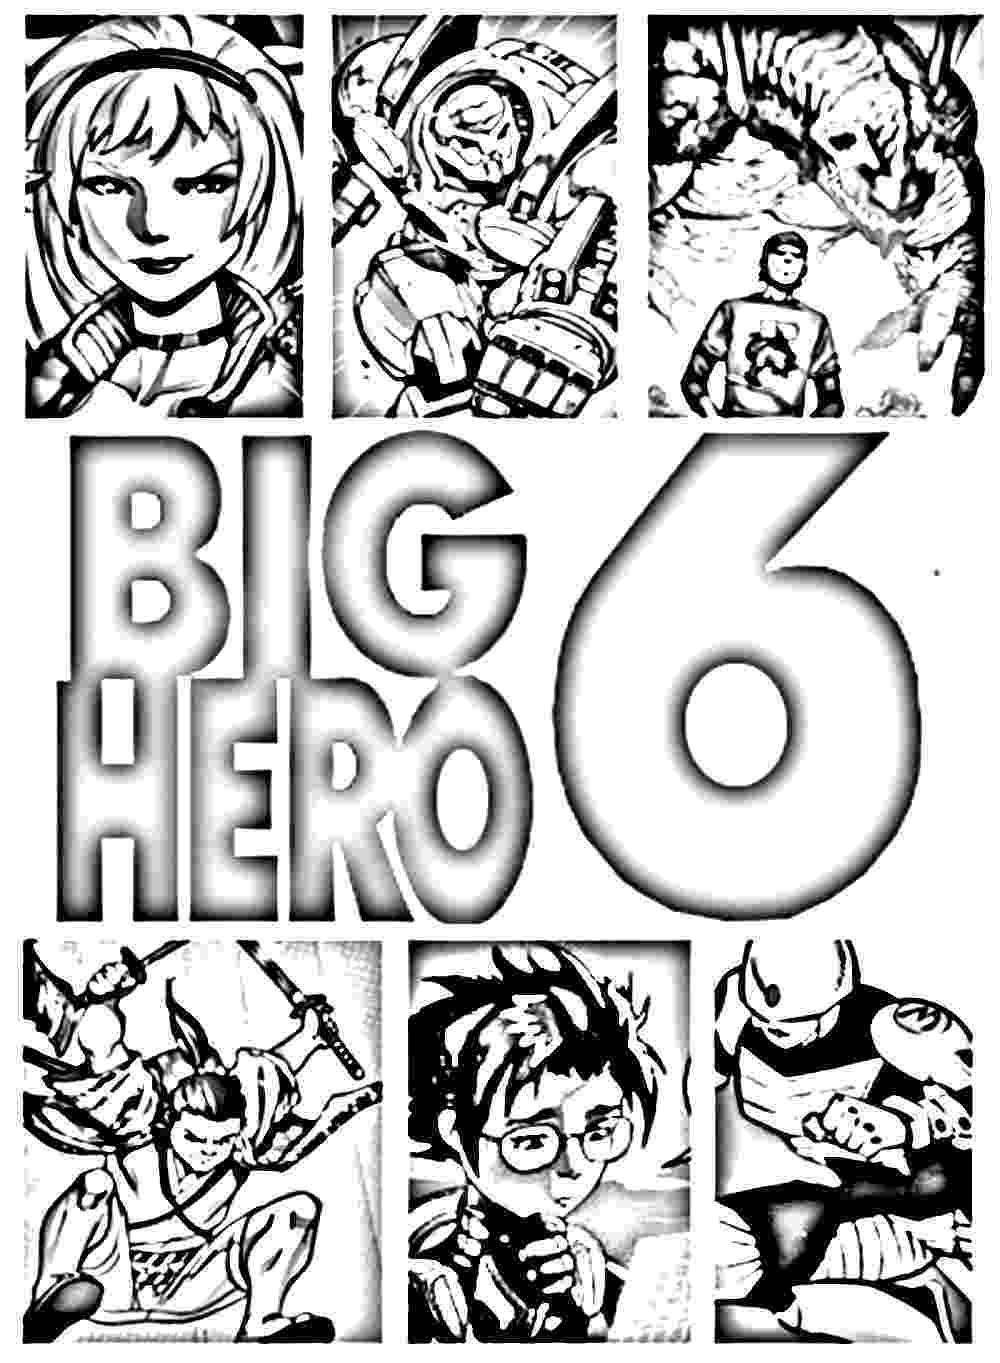 big hero 6 free colouring pages big hero 6 to print for free big hero 6 kids coloring pages pages big colouring 6 hero free